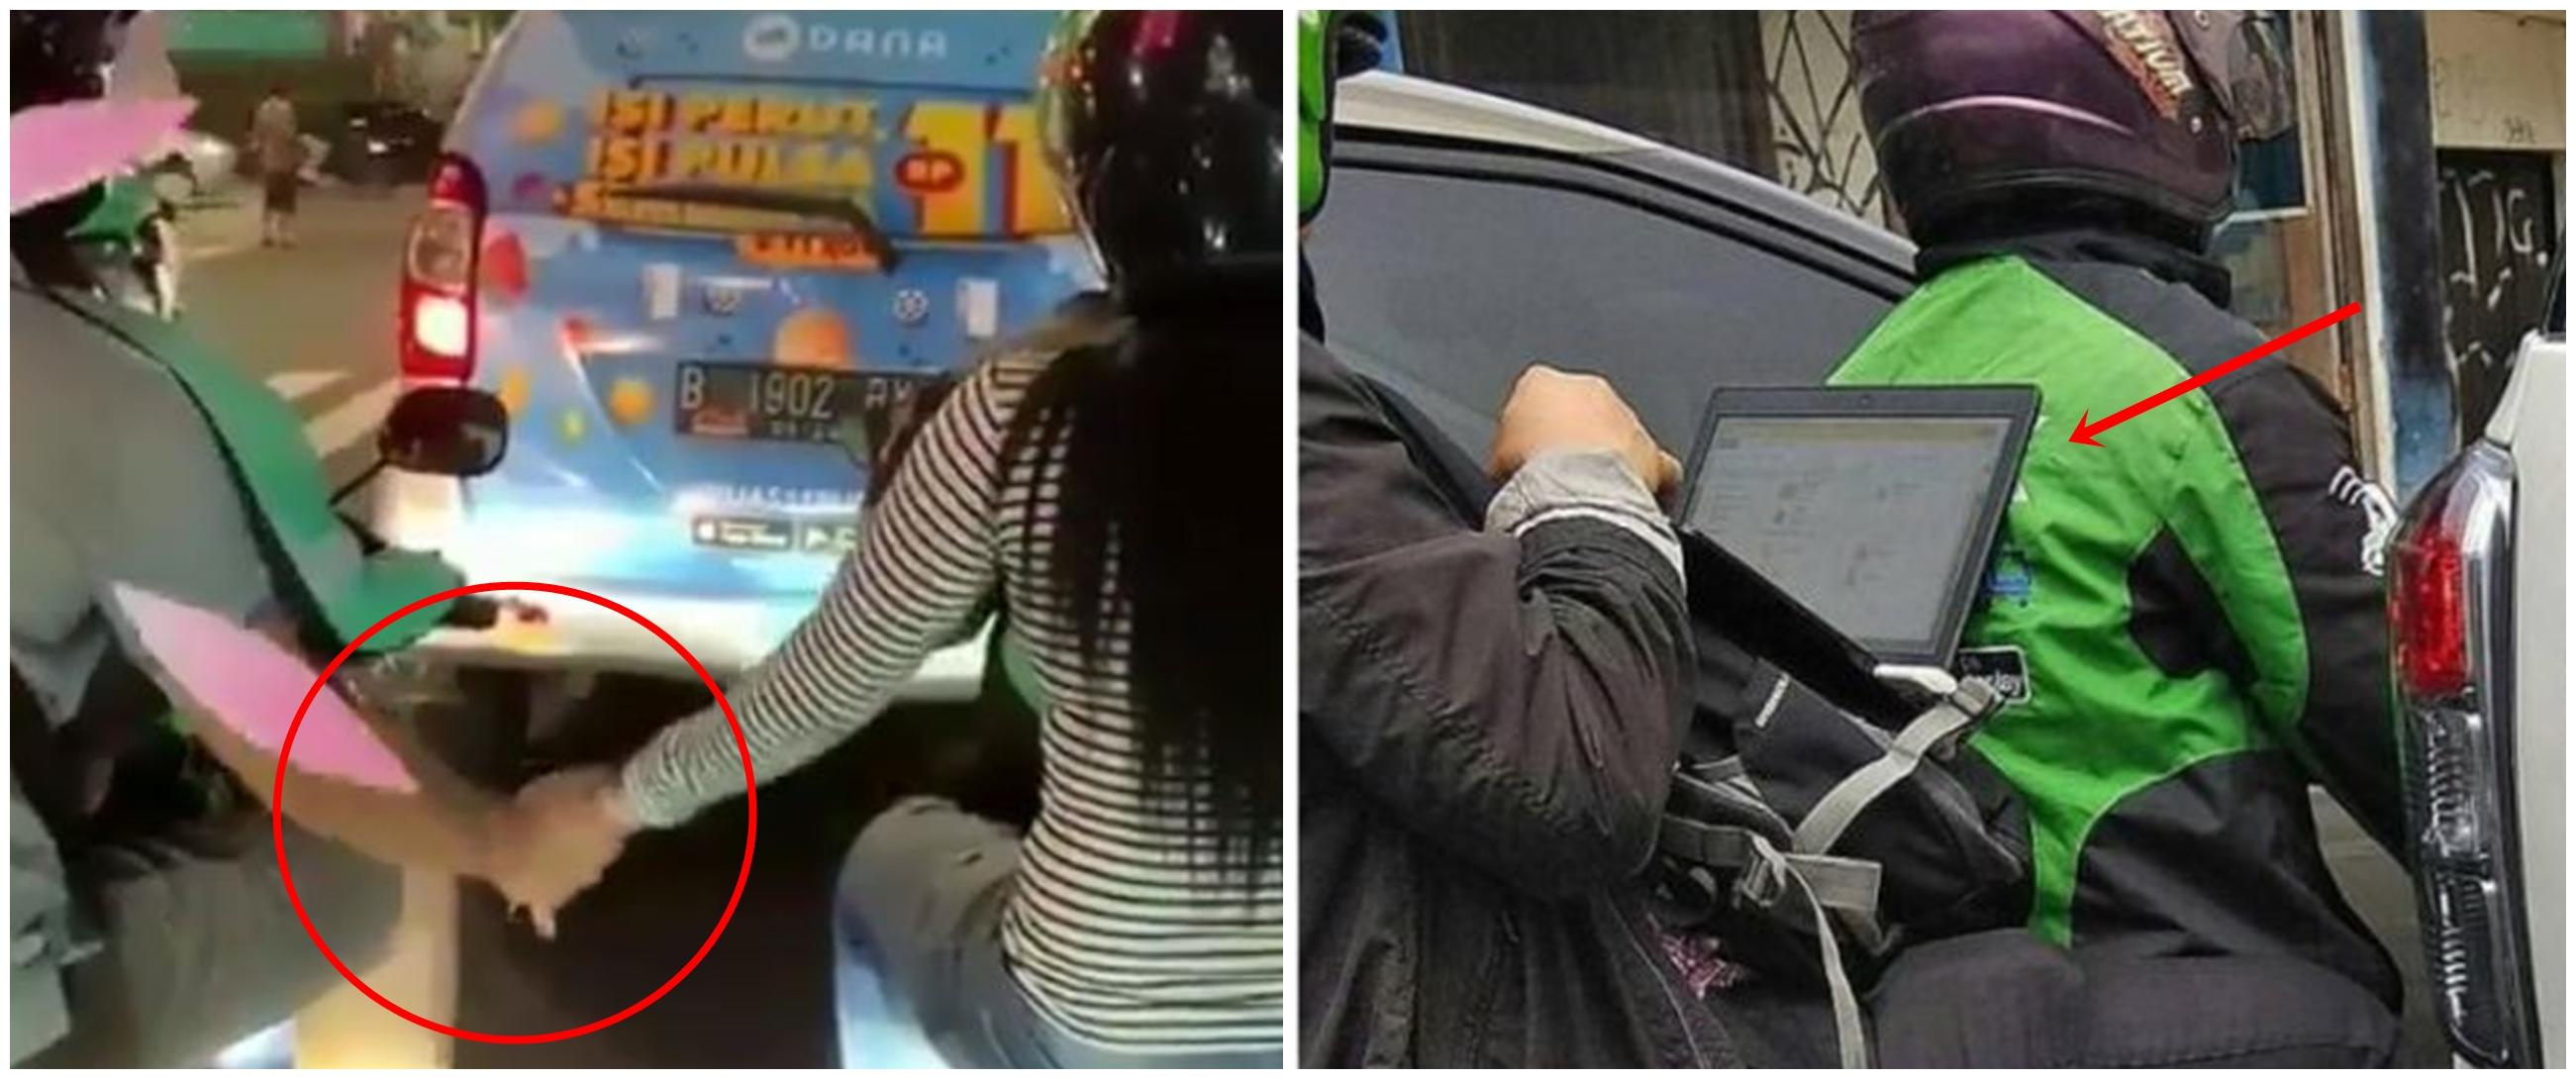 7 Kelakuan lucu penumpang ojek online saat berhenti di lampu merah